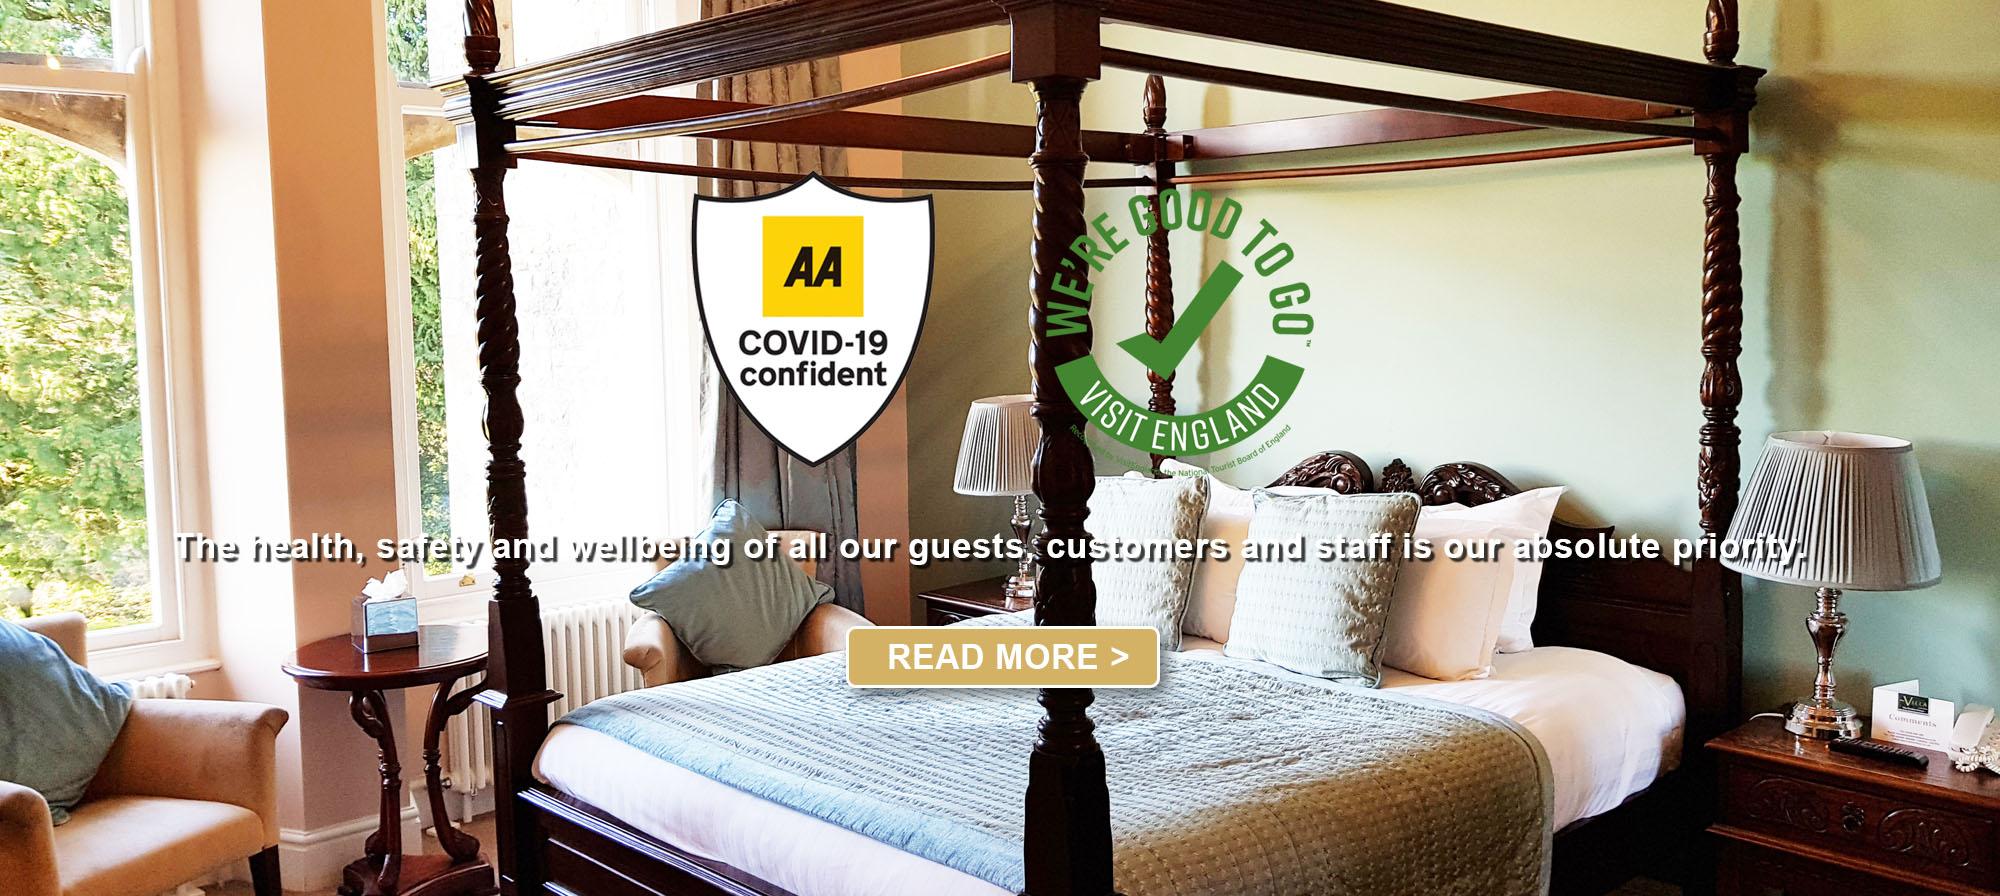 Covid secure hotel in cumbria lakes